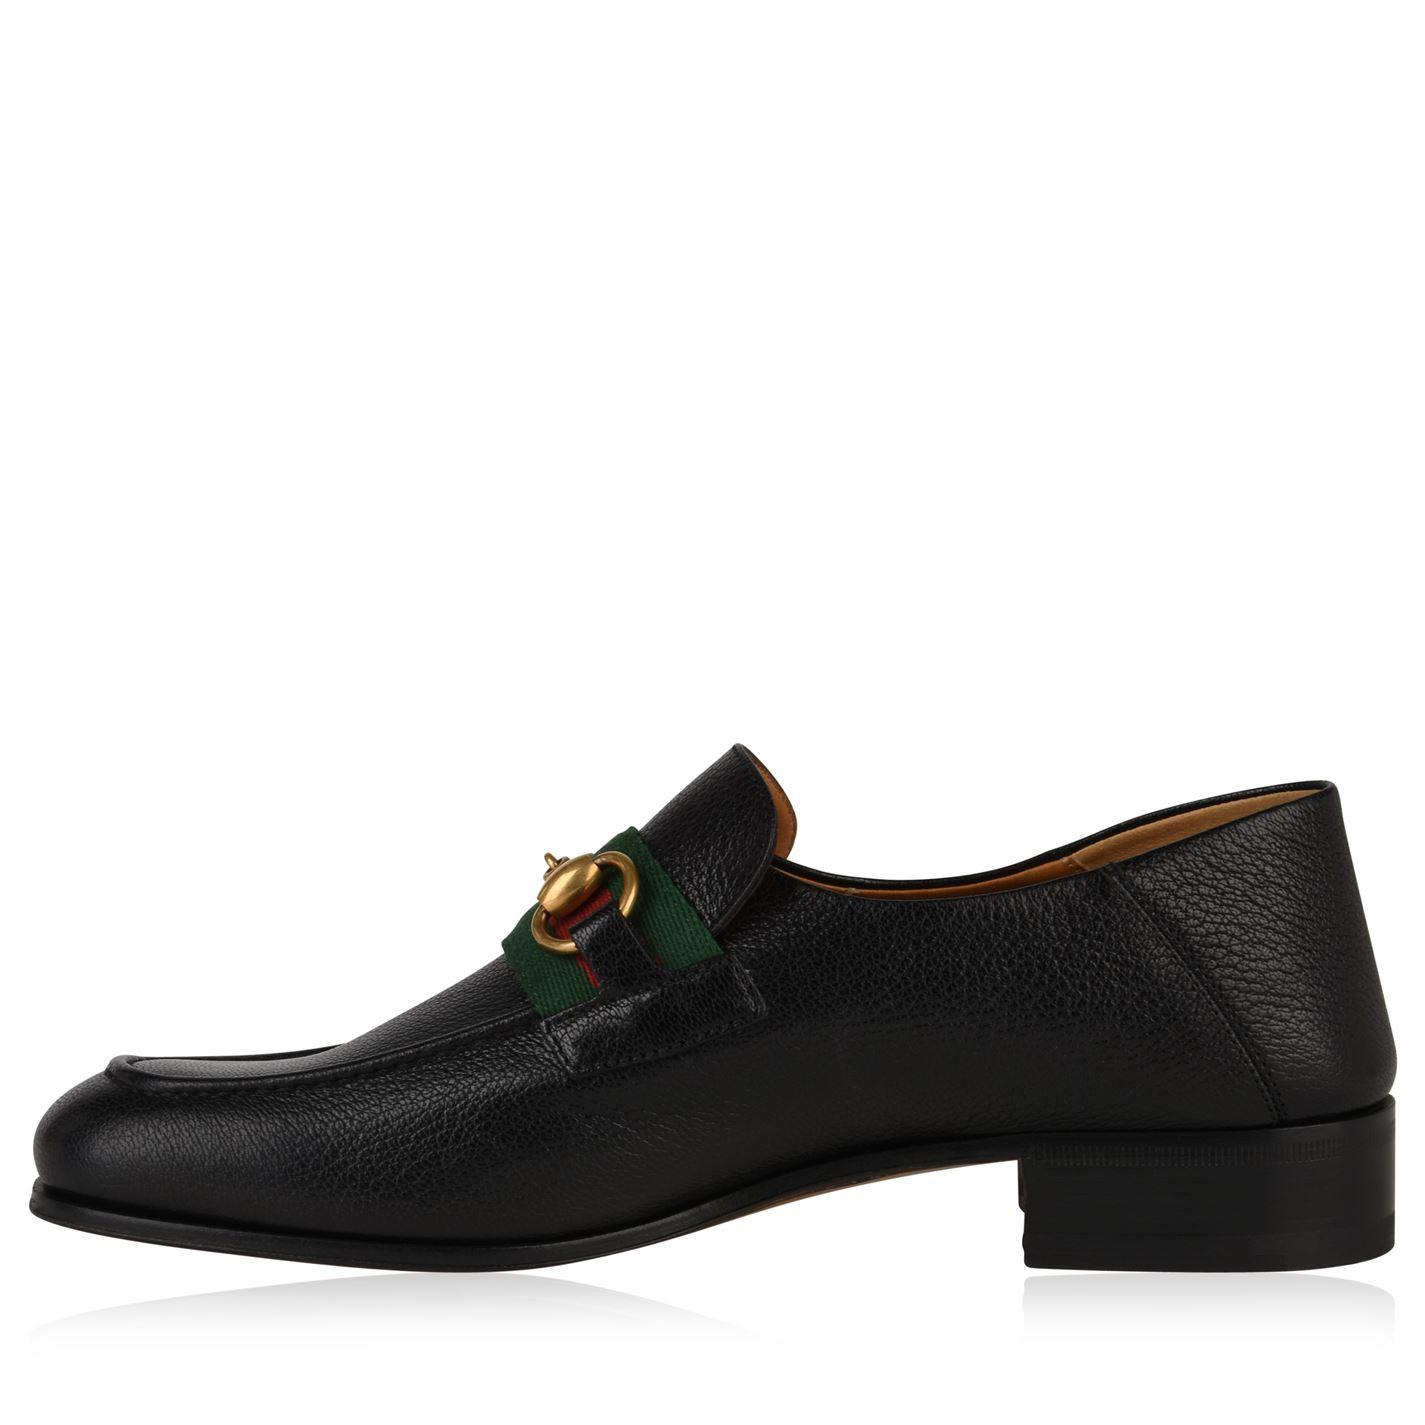 c315c55eb Gucci - Black Leather Horsebit Loafer for Men - Lyst. View fullscreen